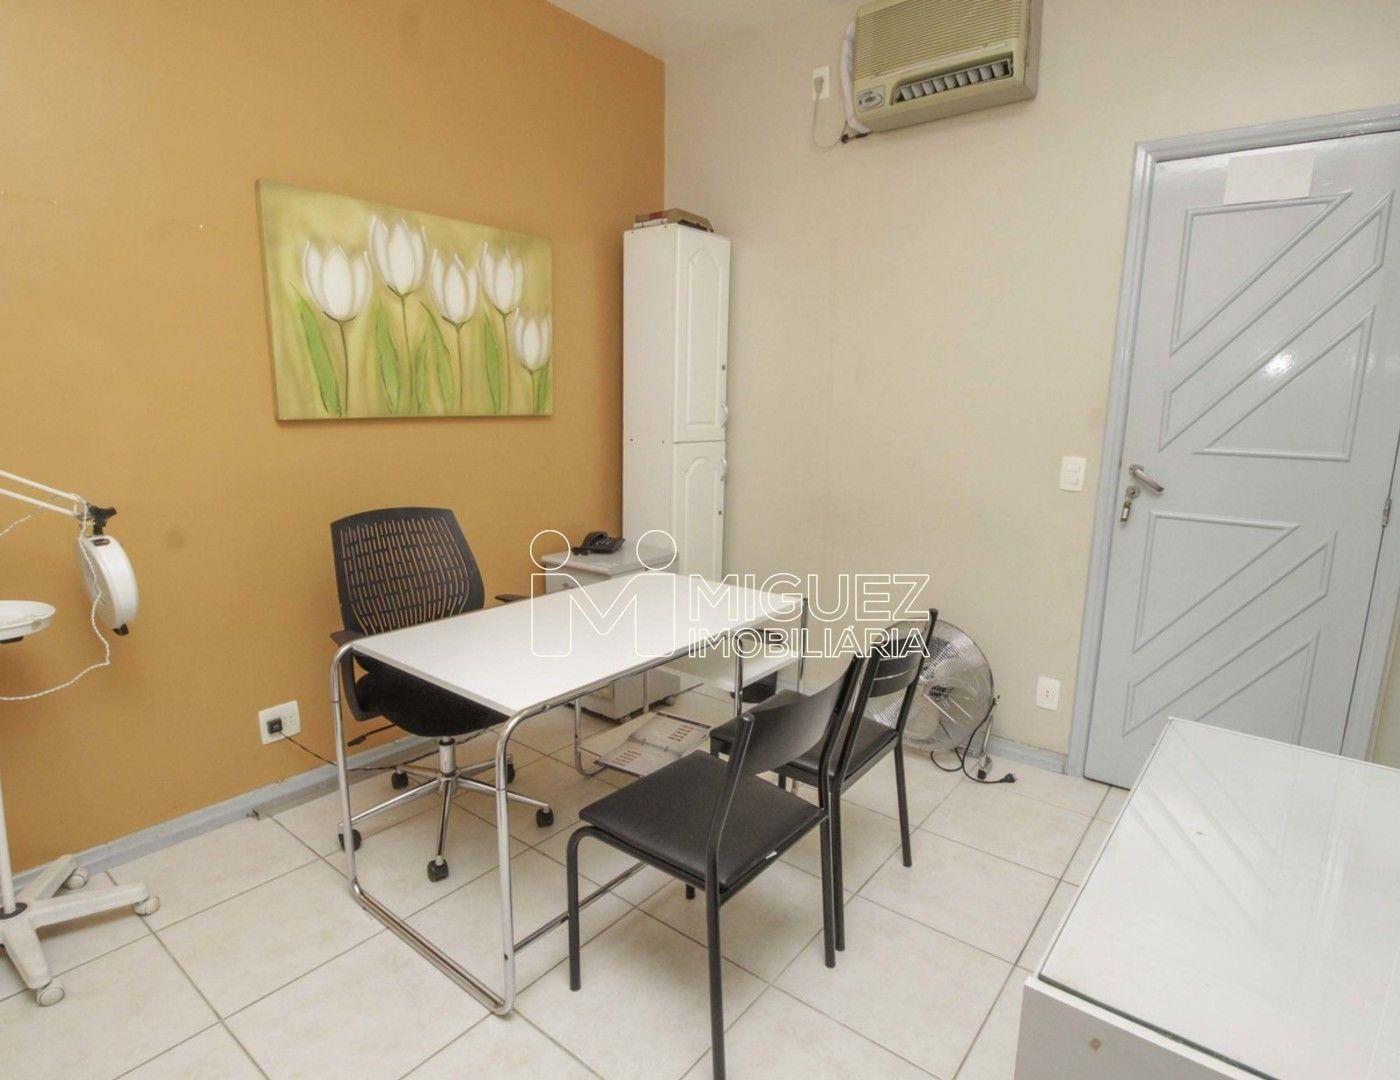 Casa, venda, Rua Doutor Pereira dos Santos - Tijuca , Rio de janeiro